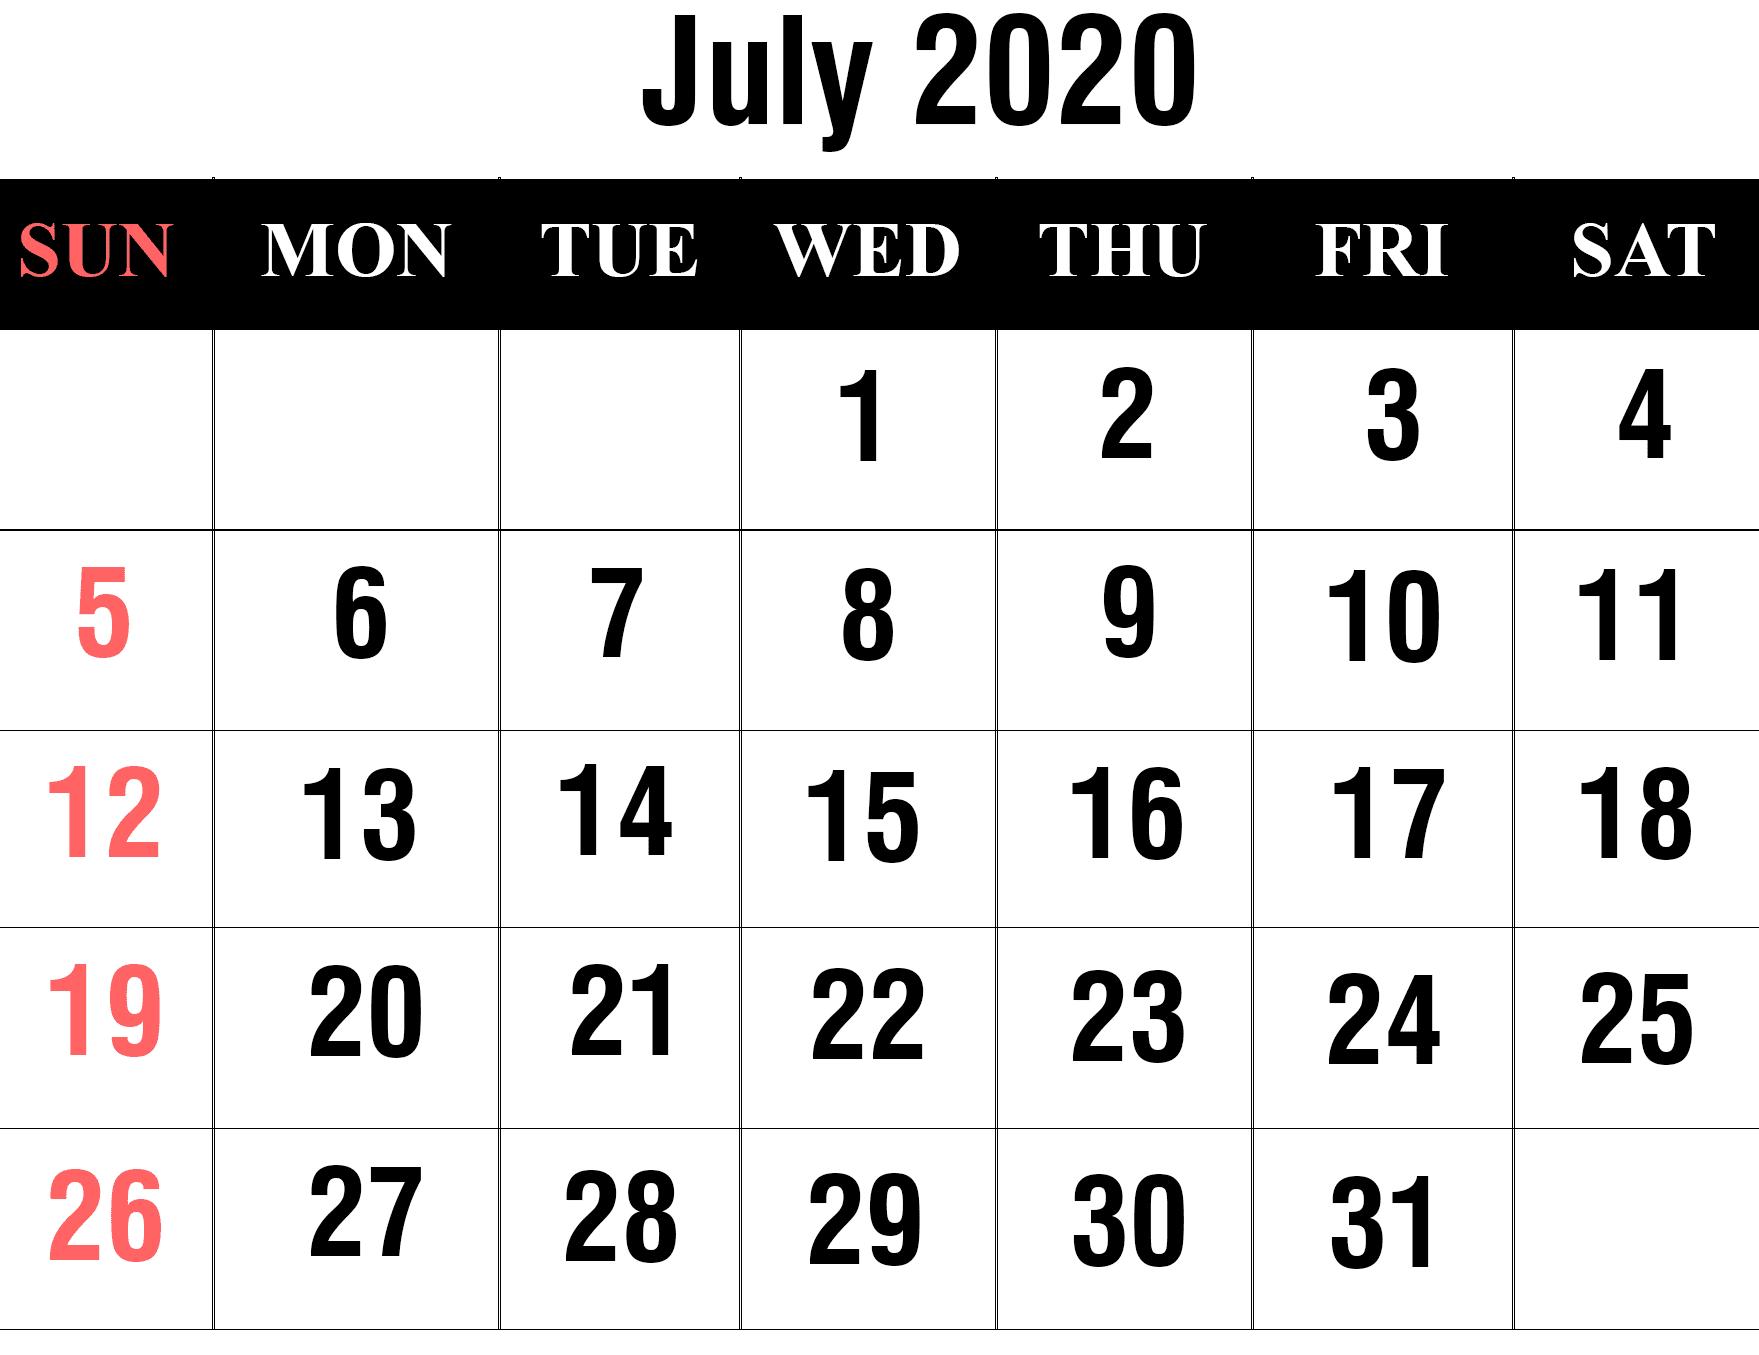 July 2020 Calendar Printable Free